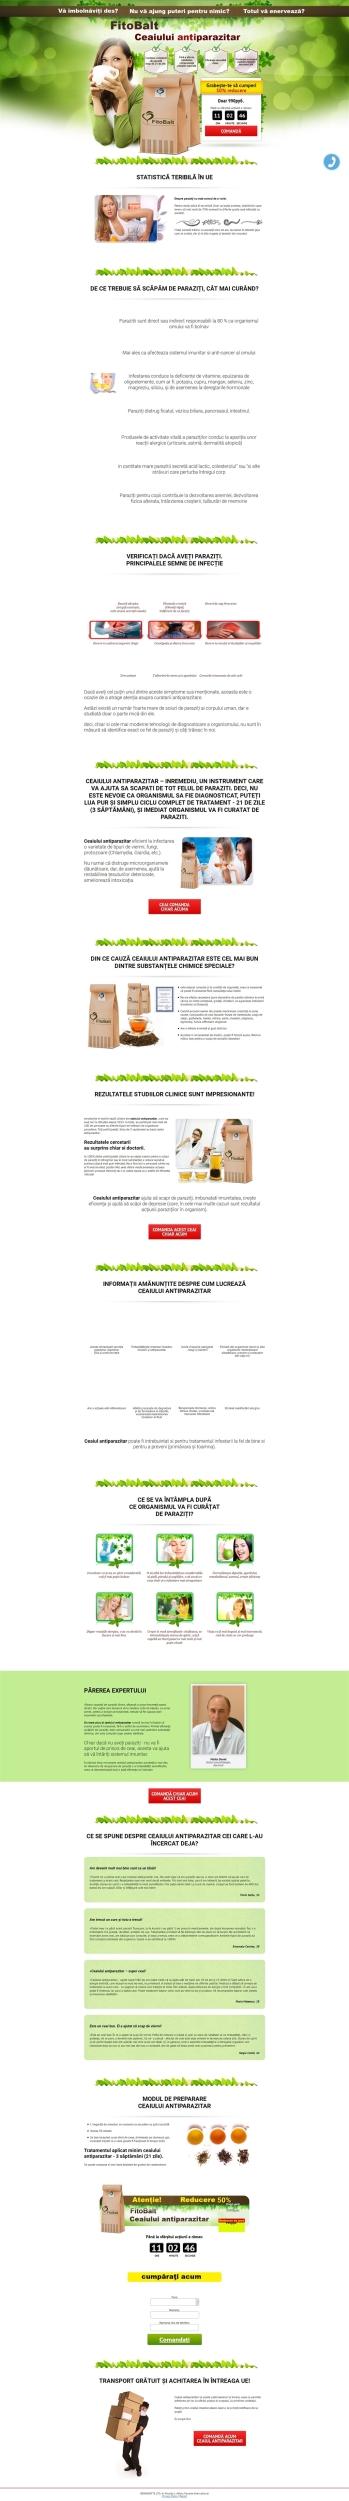 sarcini de trichiocefalie papillomavirus 45